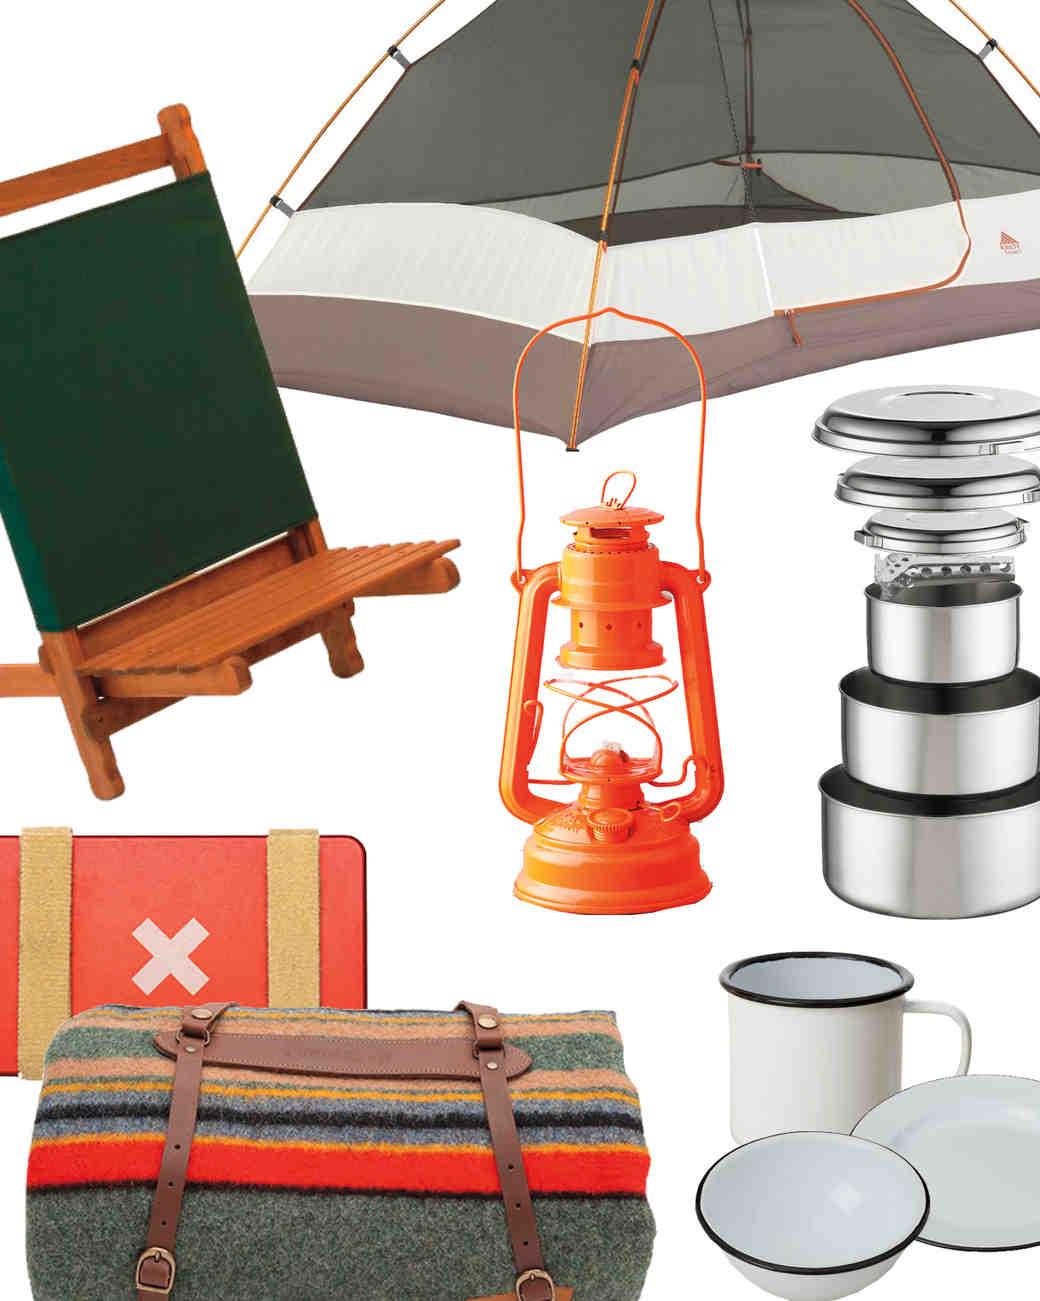 date-night-registry-ideas-camping-1014.jpg